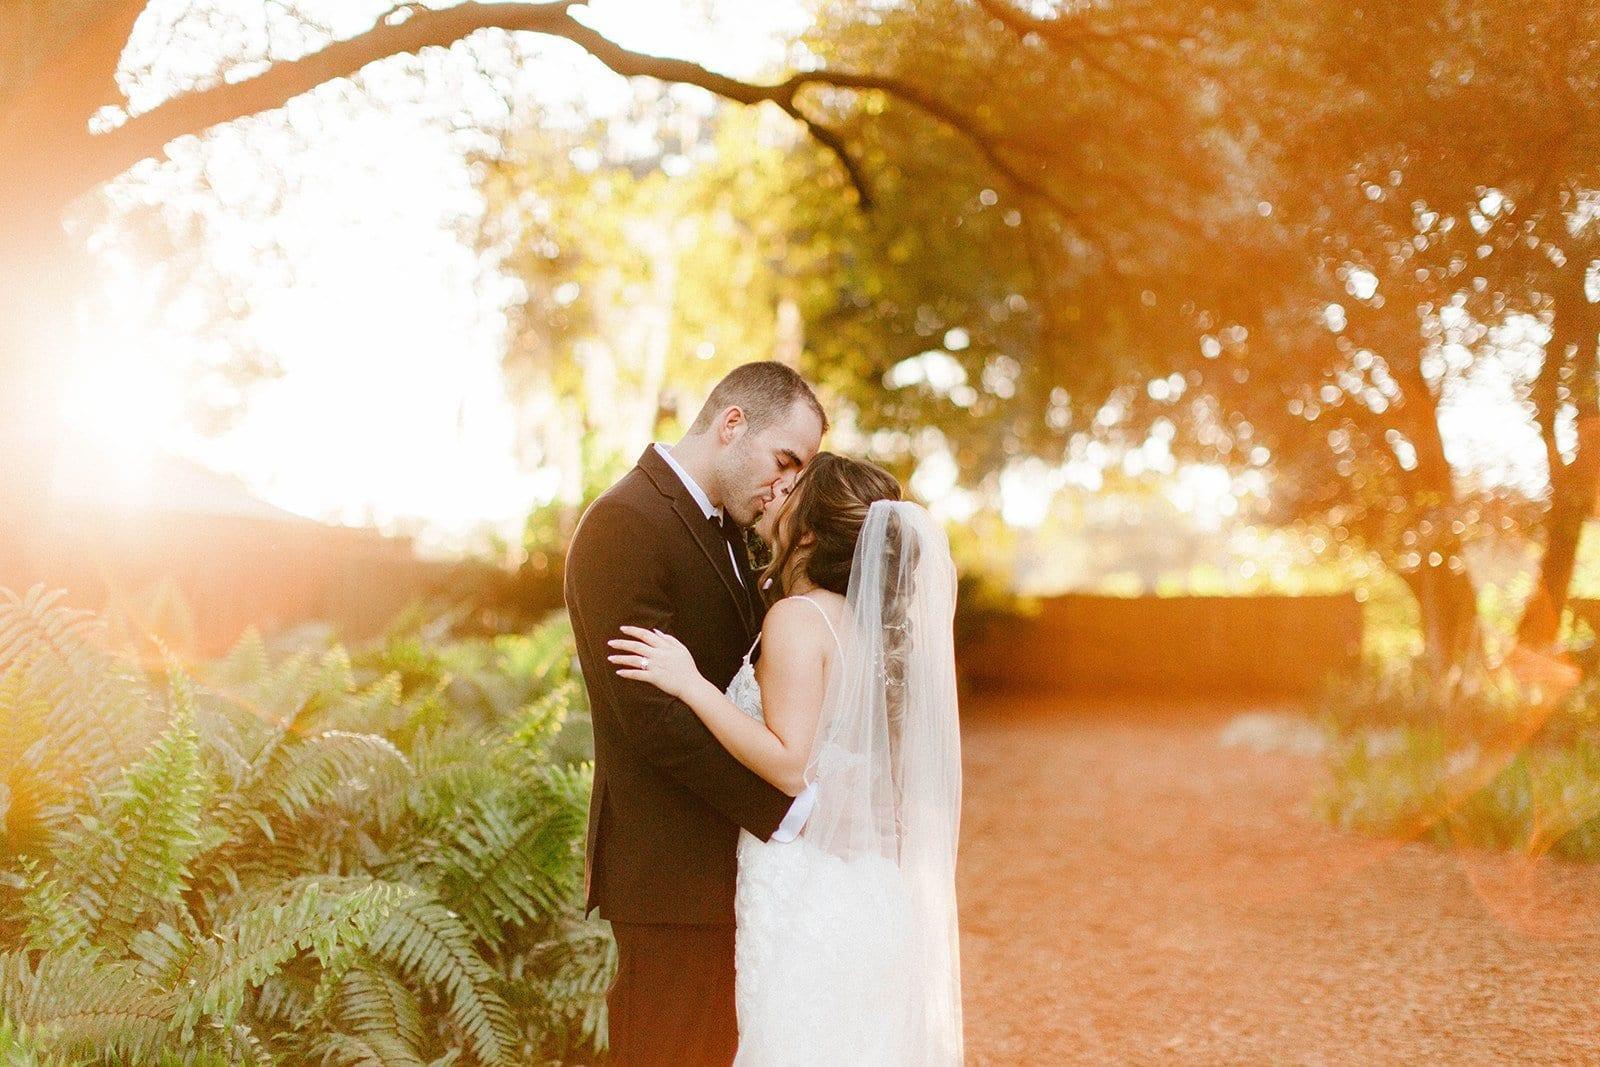 Francesca + Danny's Modern Romantic Wedding